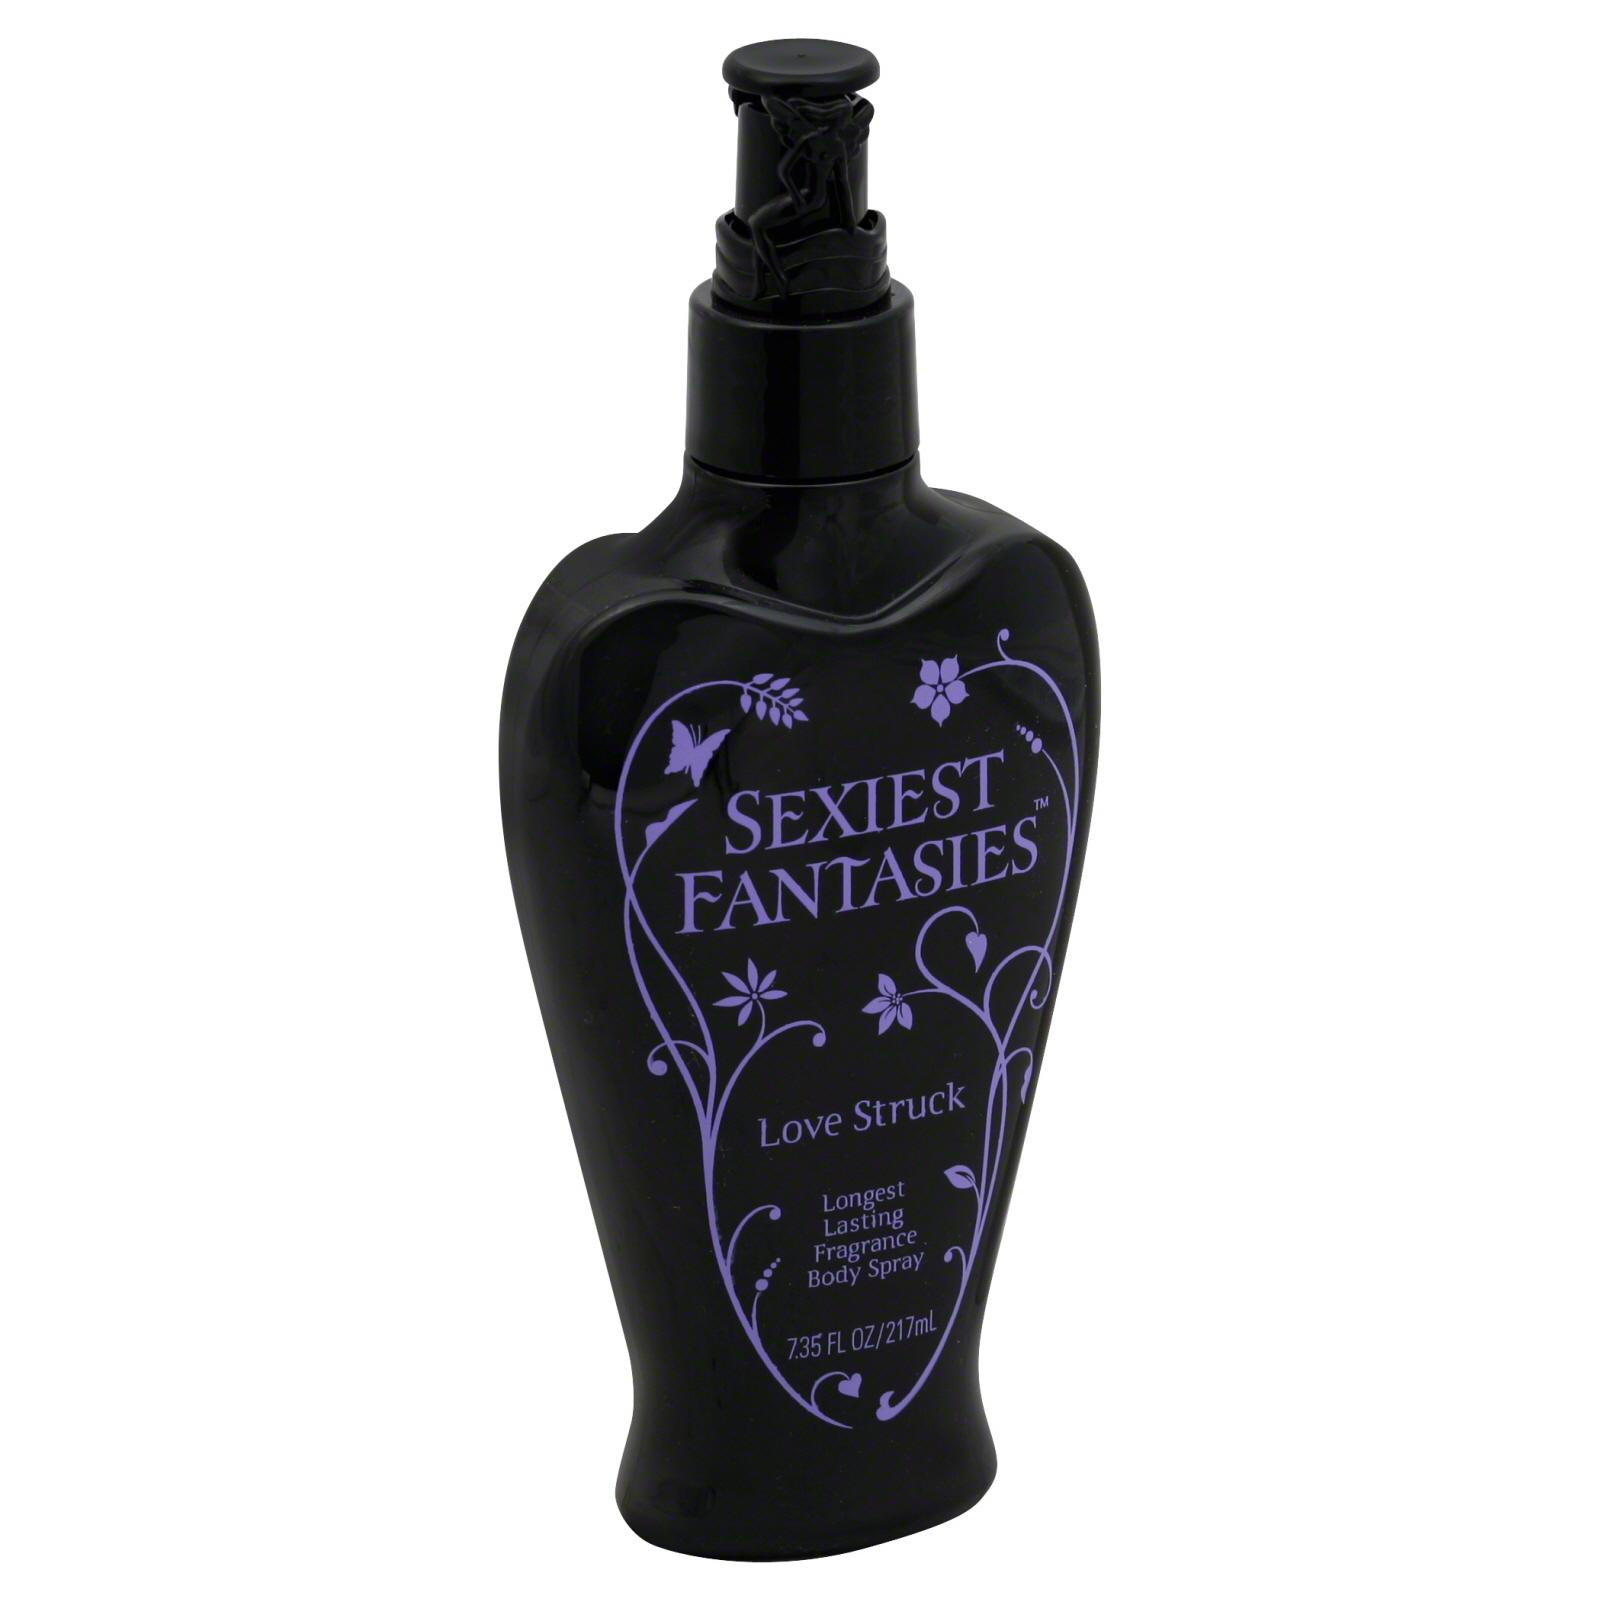 Body Fantasies Body Spray, Fragrance, Longest Lasting, Love Struck, 7.35 fl oz (217 ml) PartNumber: 015W362138110001P KsnValue: 015W362138110001 MfgPartNumber: 0177